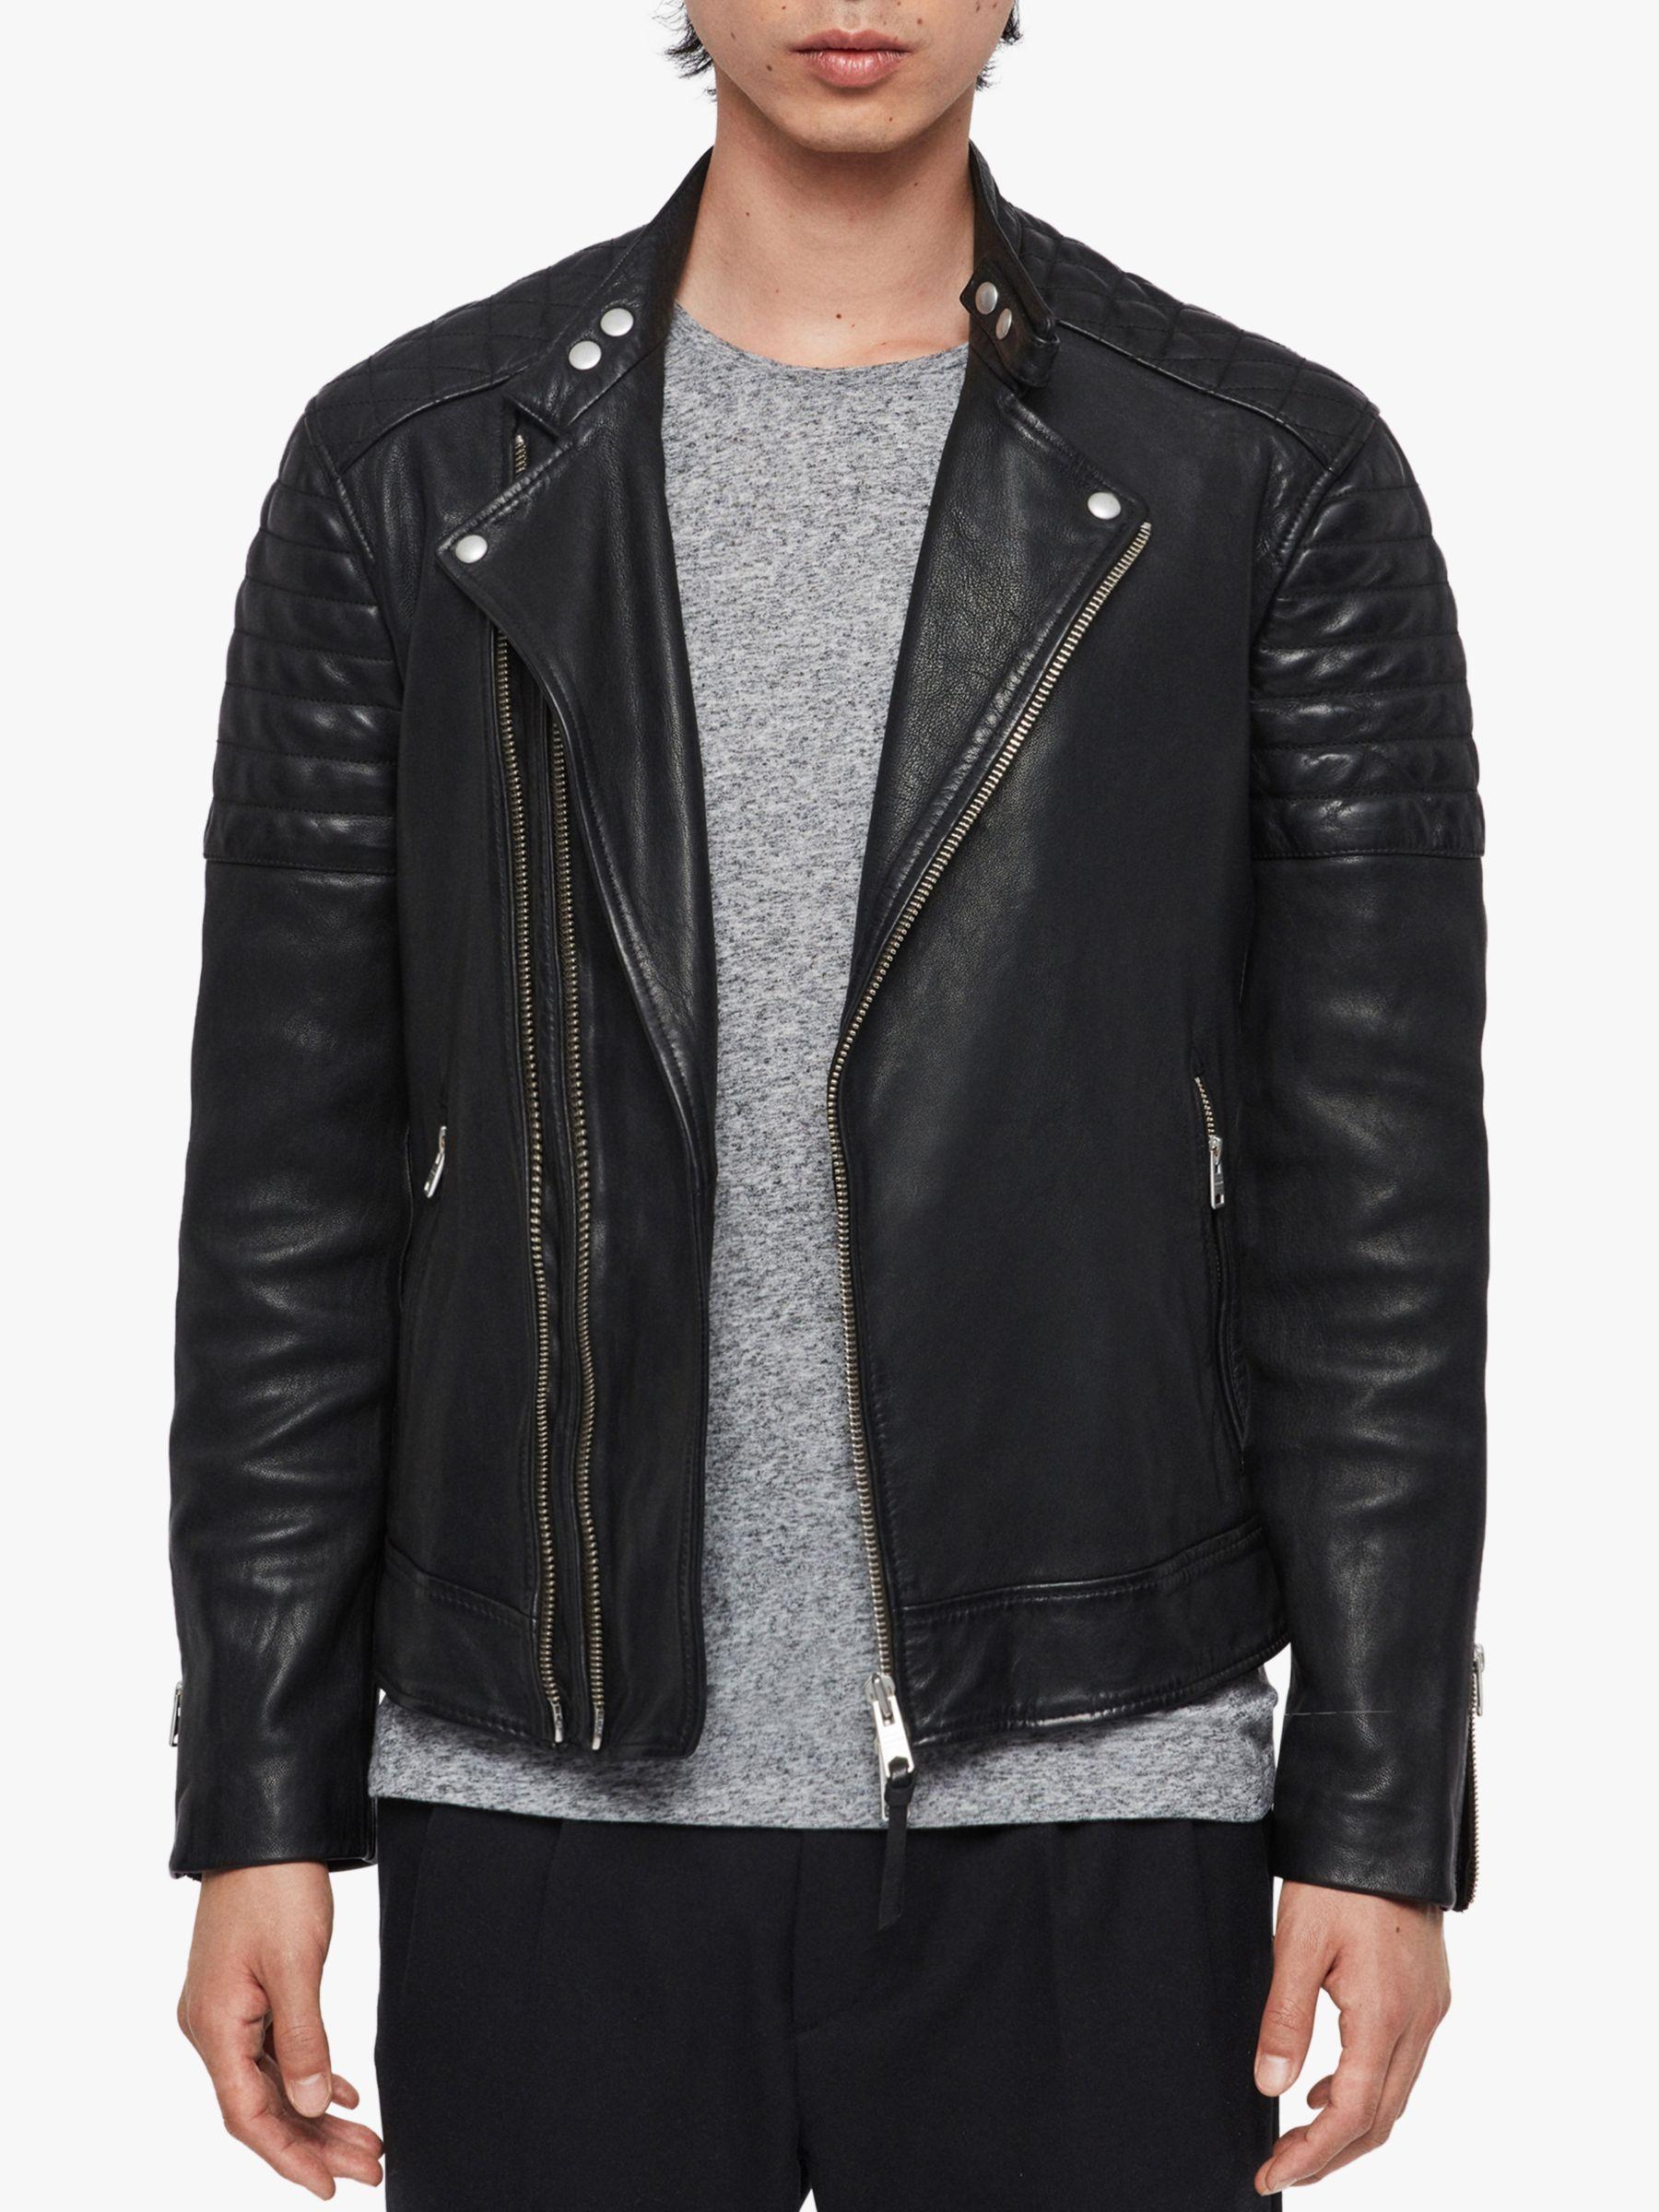 AllSaints Rigby Leather Biker Jacket, Black at John Lewis